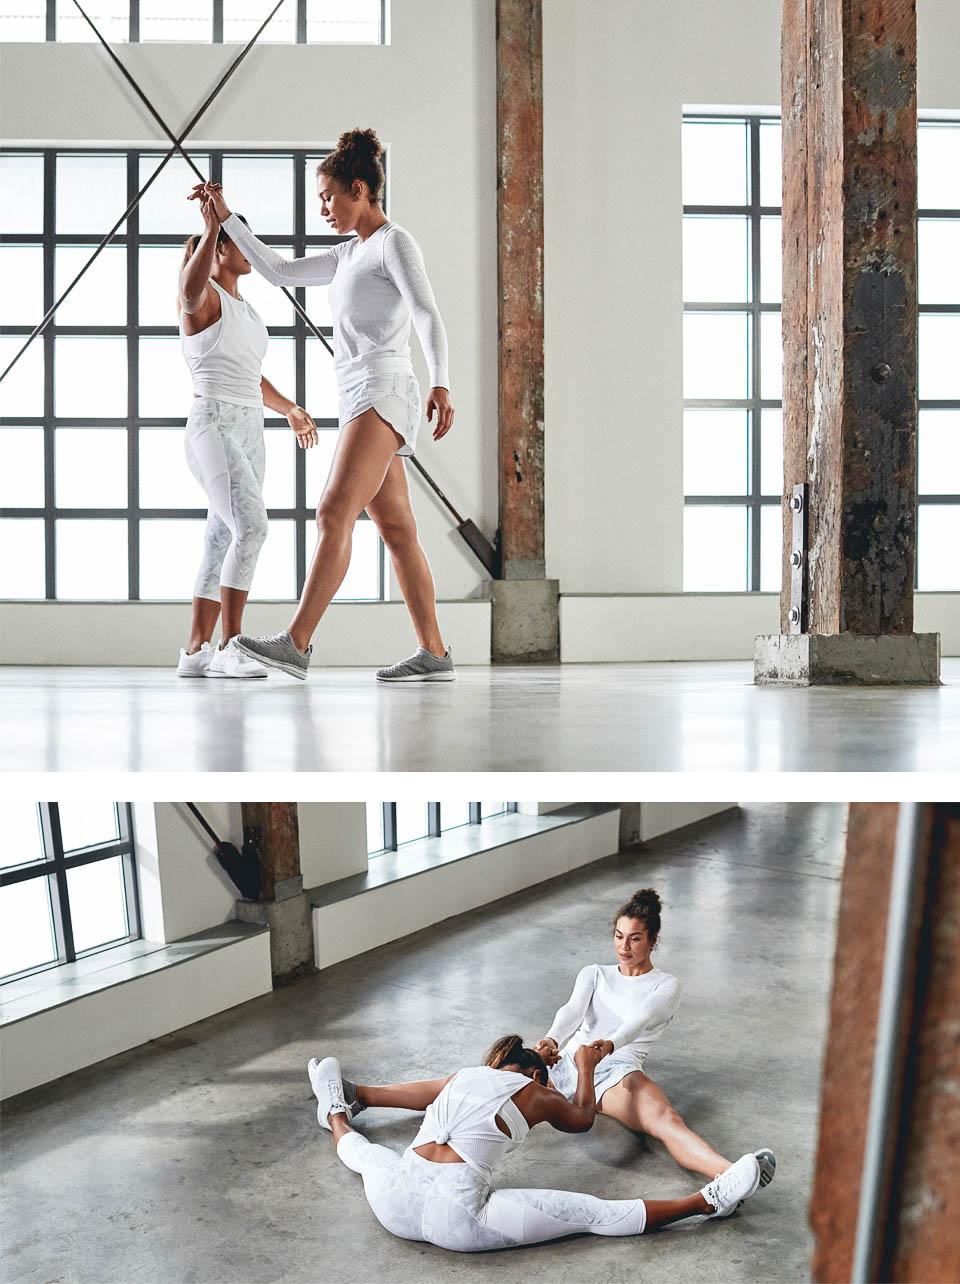 Mahina-Garcia-Catrina-Judge-Training-Workout-Vancouver-Canada-photoshoot-lululemon-athletica-Matt-Korinek-Photographer-960px-3.jpg